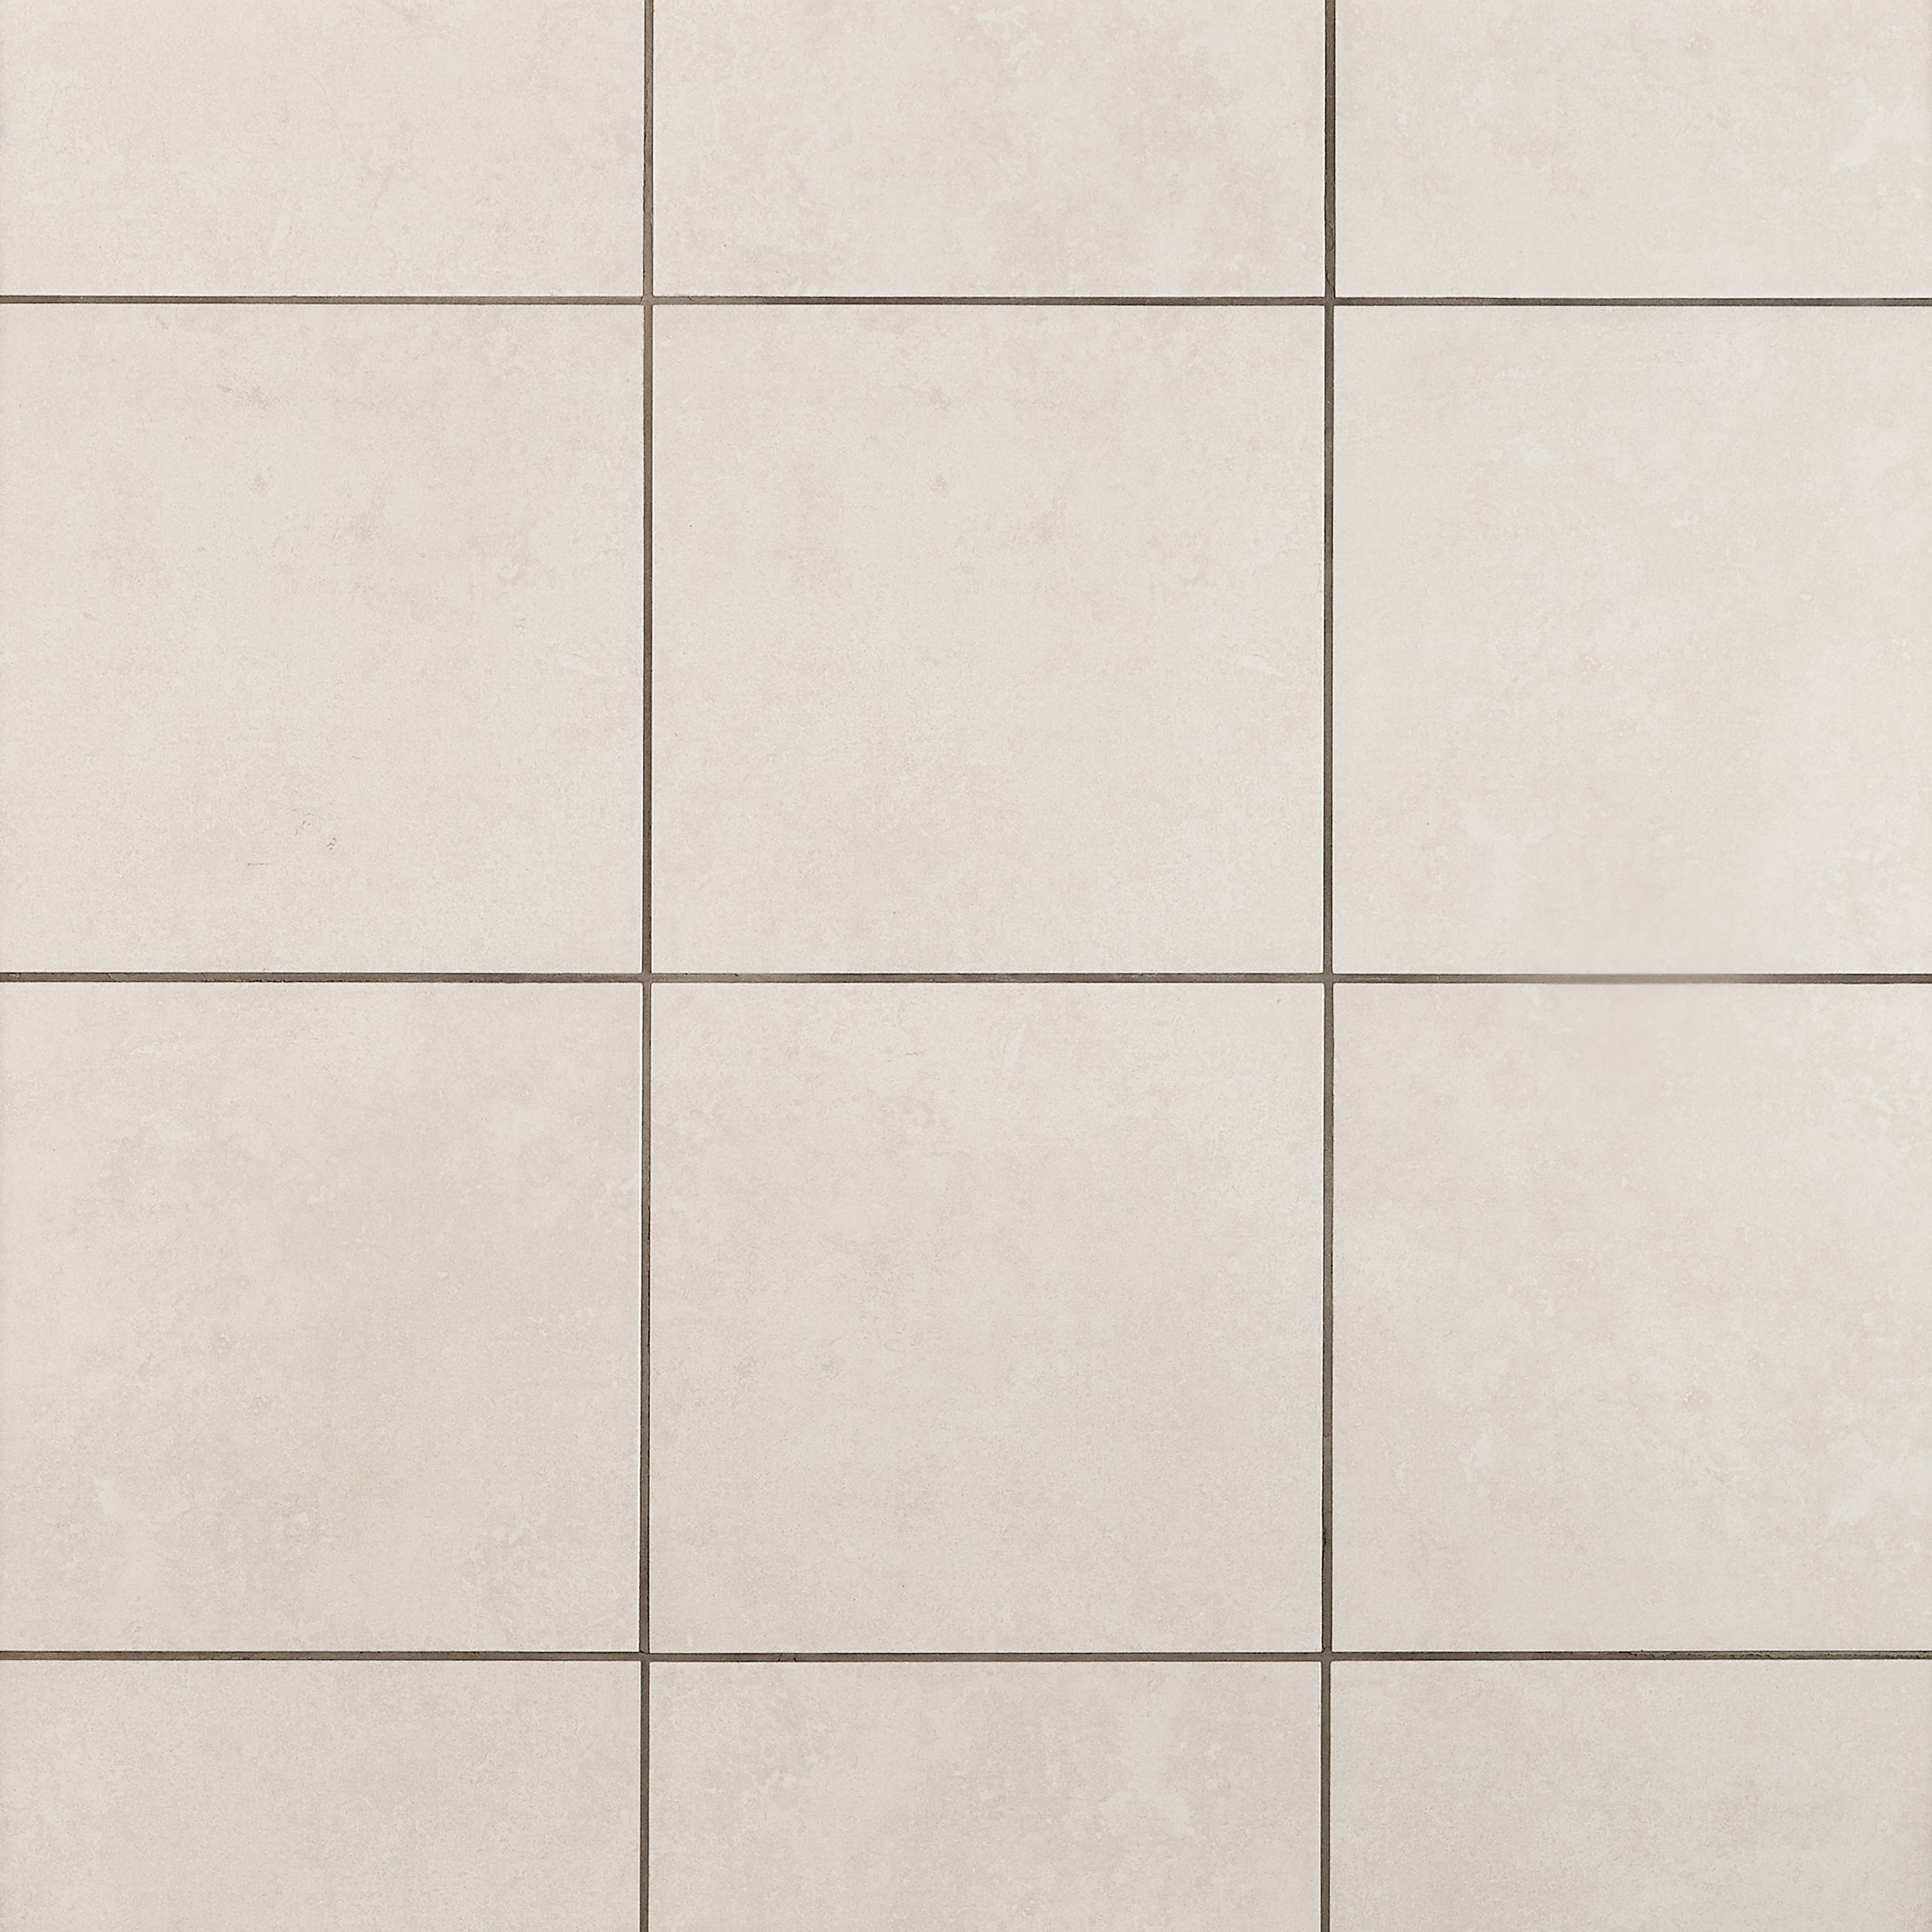 Tulsa Gray Ceramic Tile 12 X 12 100486554 Floor And